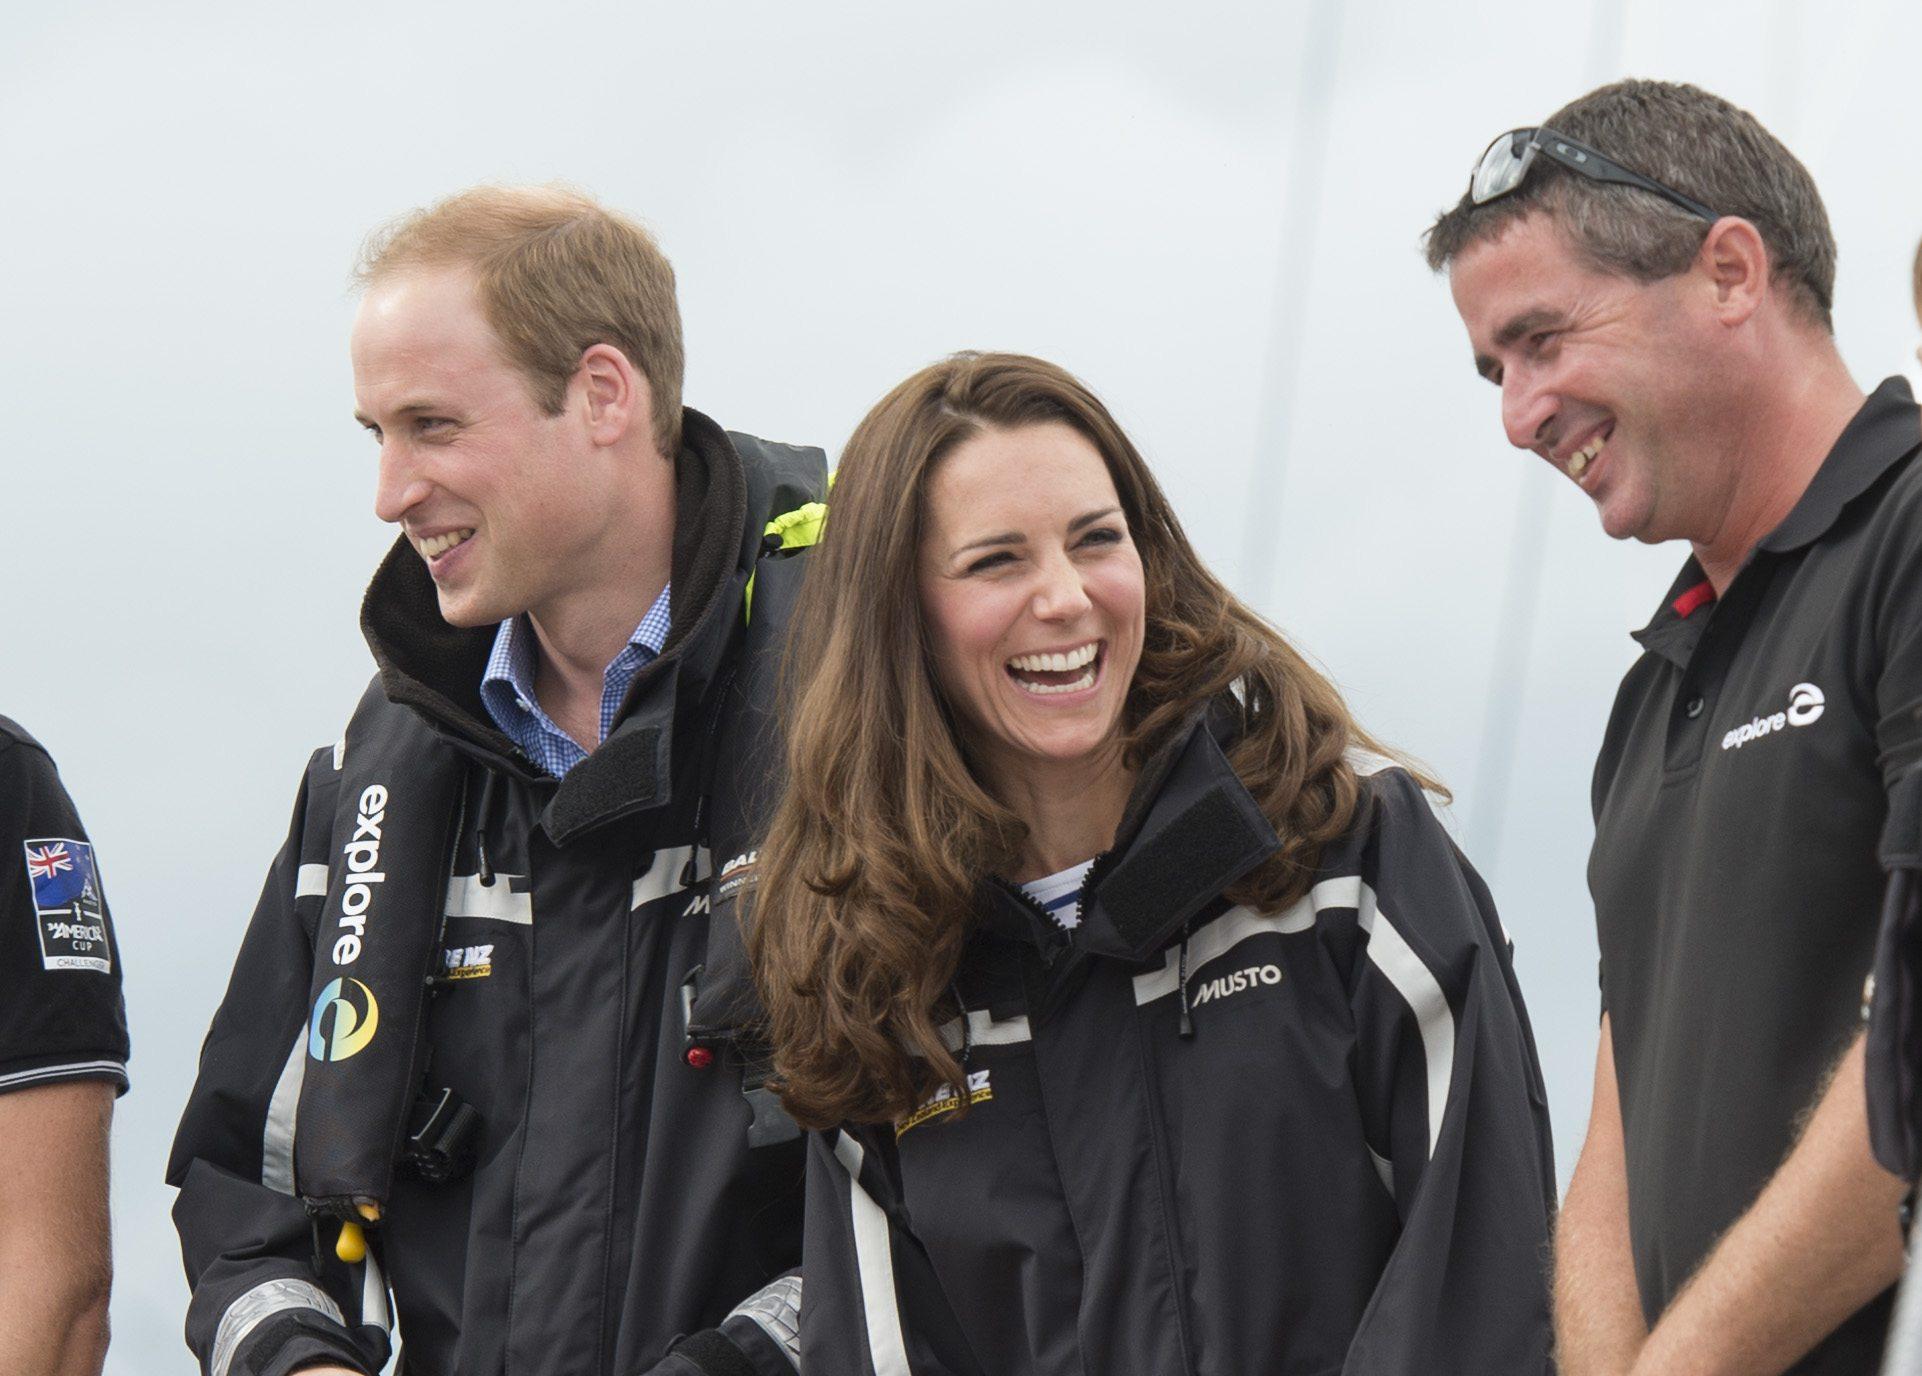 The Duke And Duchess Of Cambridge Tour Australia And New Zealand - Day 5